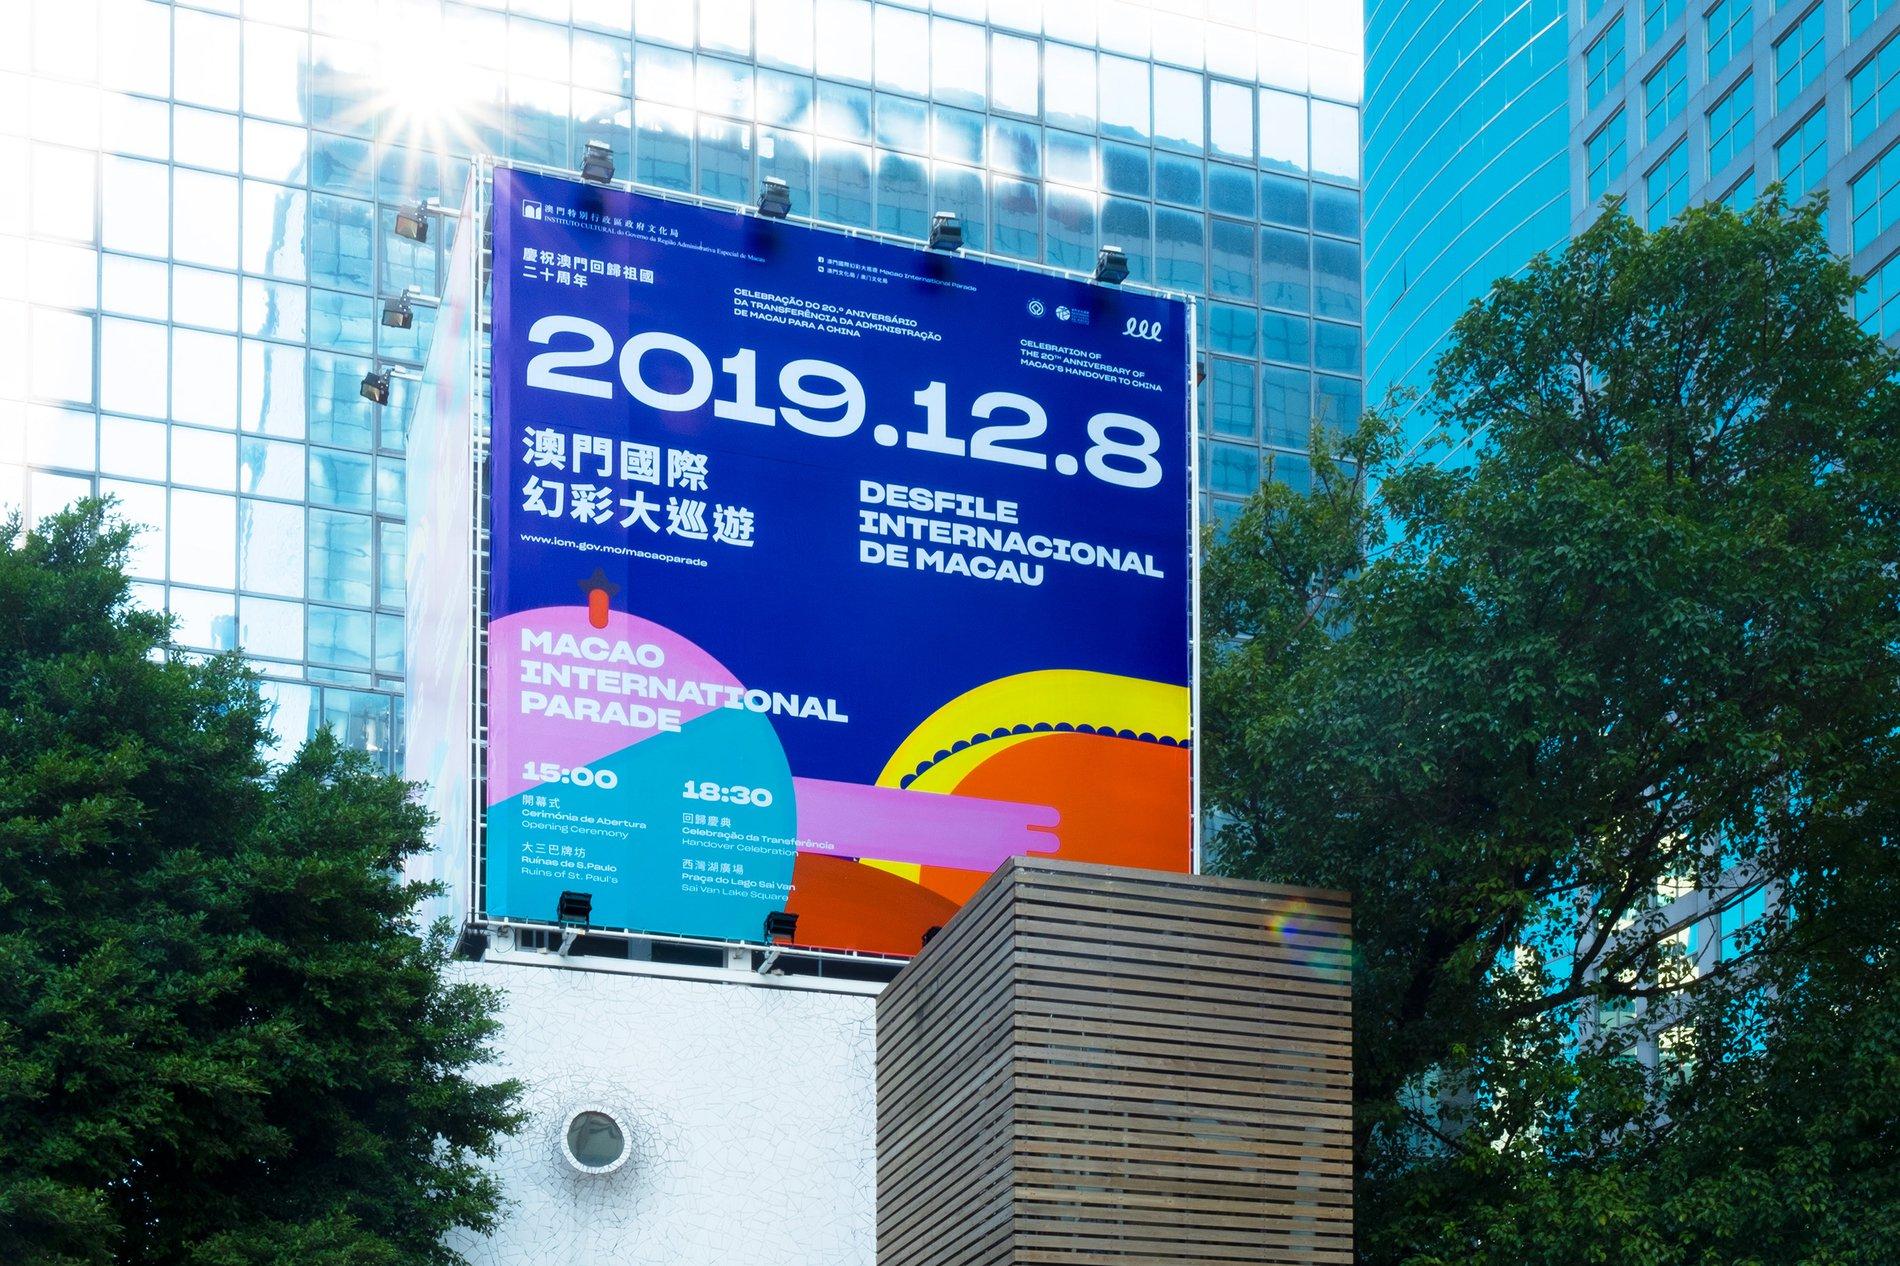 SharpGrotesk-2019-Macao-International-Parade-06.jpg